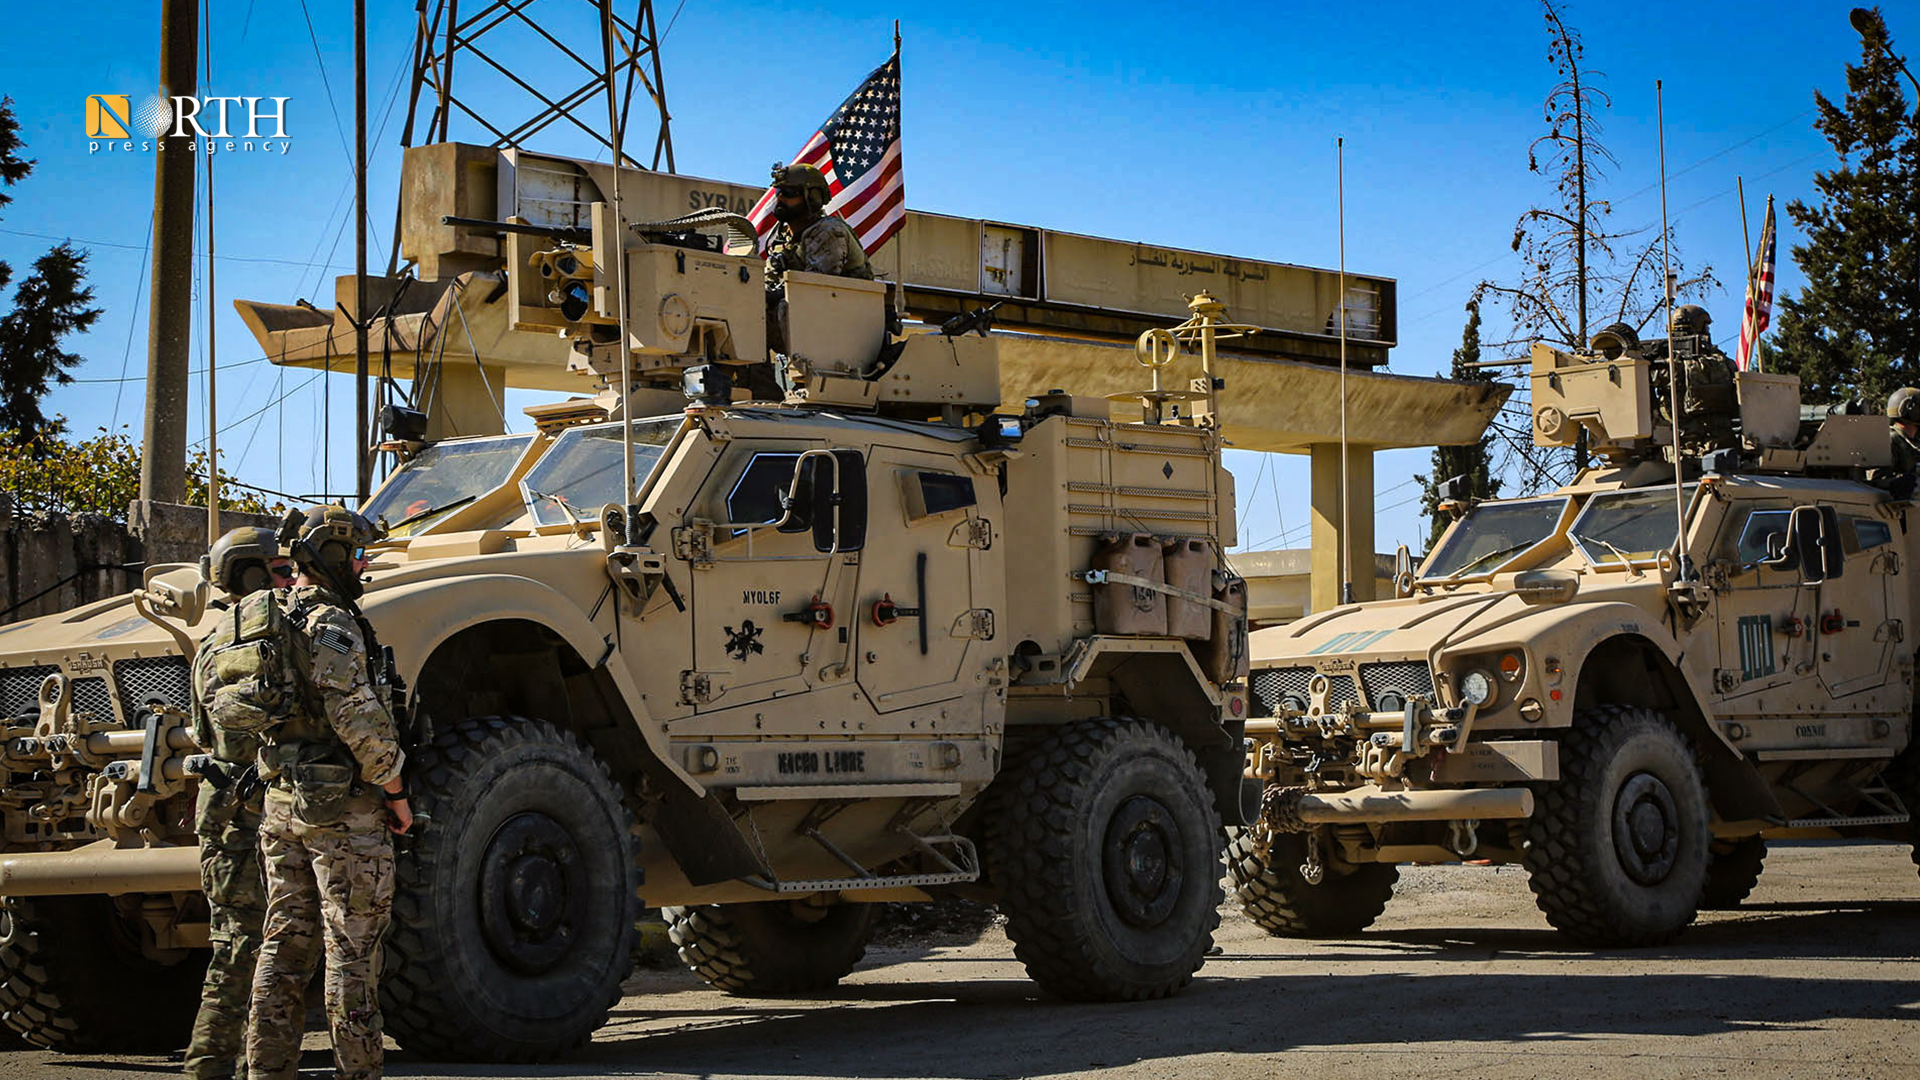 American patrol in northeastern Syria – North Press